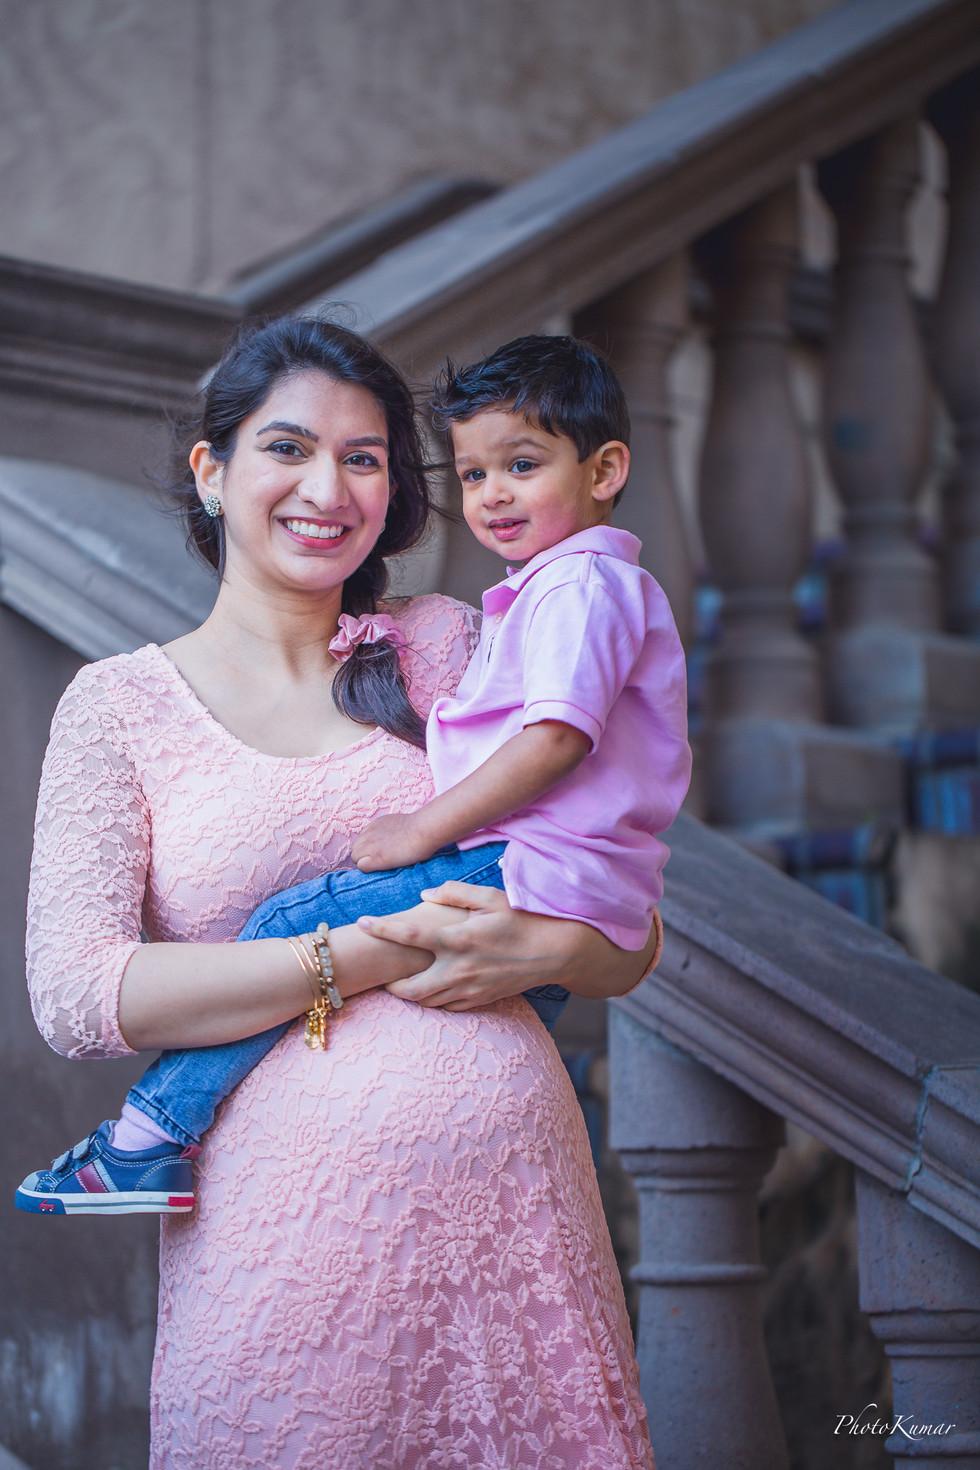 Sridhar Sonia Baby Chinta 2 (12 of 49).j